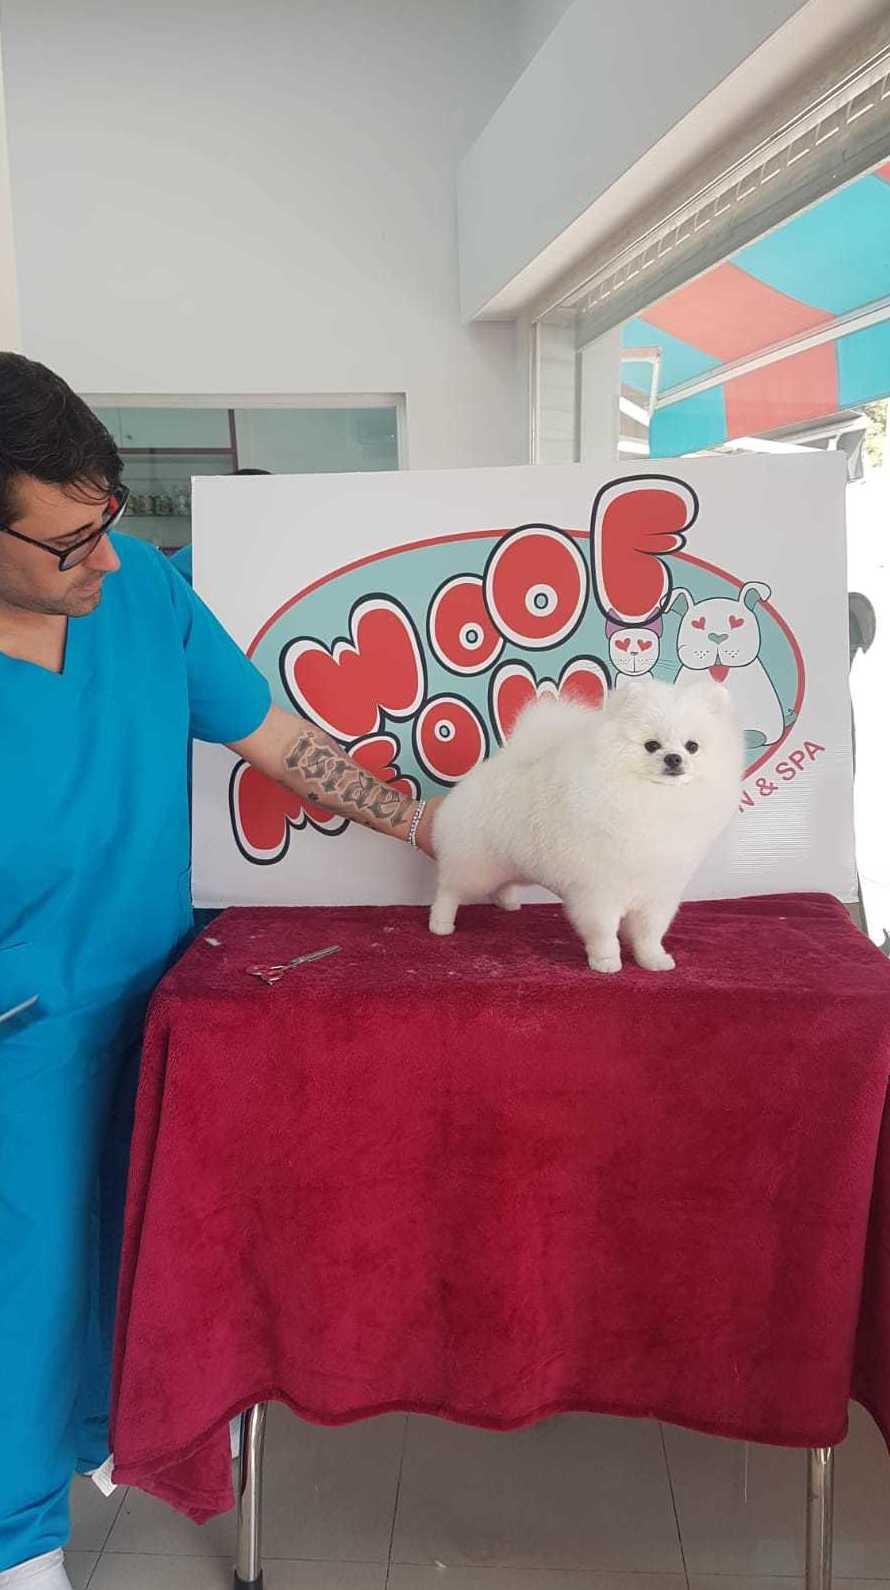 Foto 10 de Peluquerías caninas en Marbella | Peluquería Canina Woof Meow